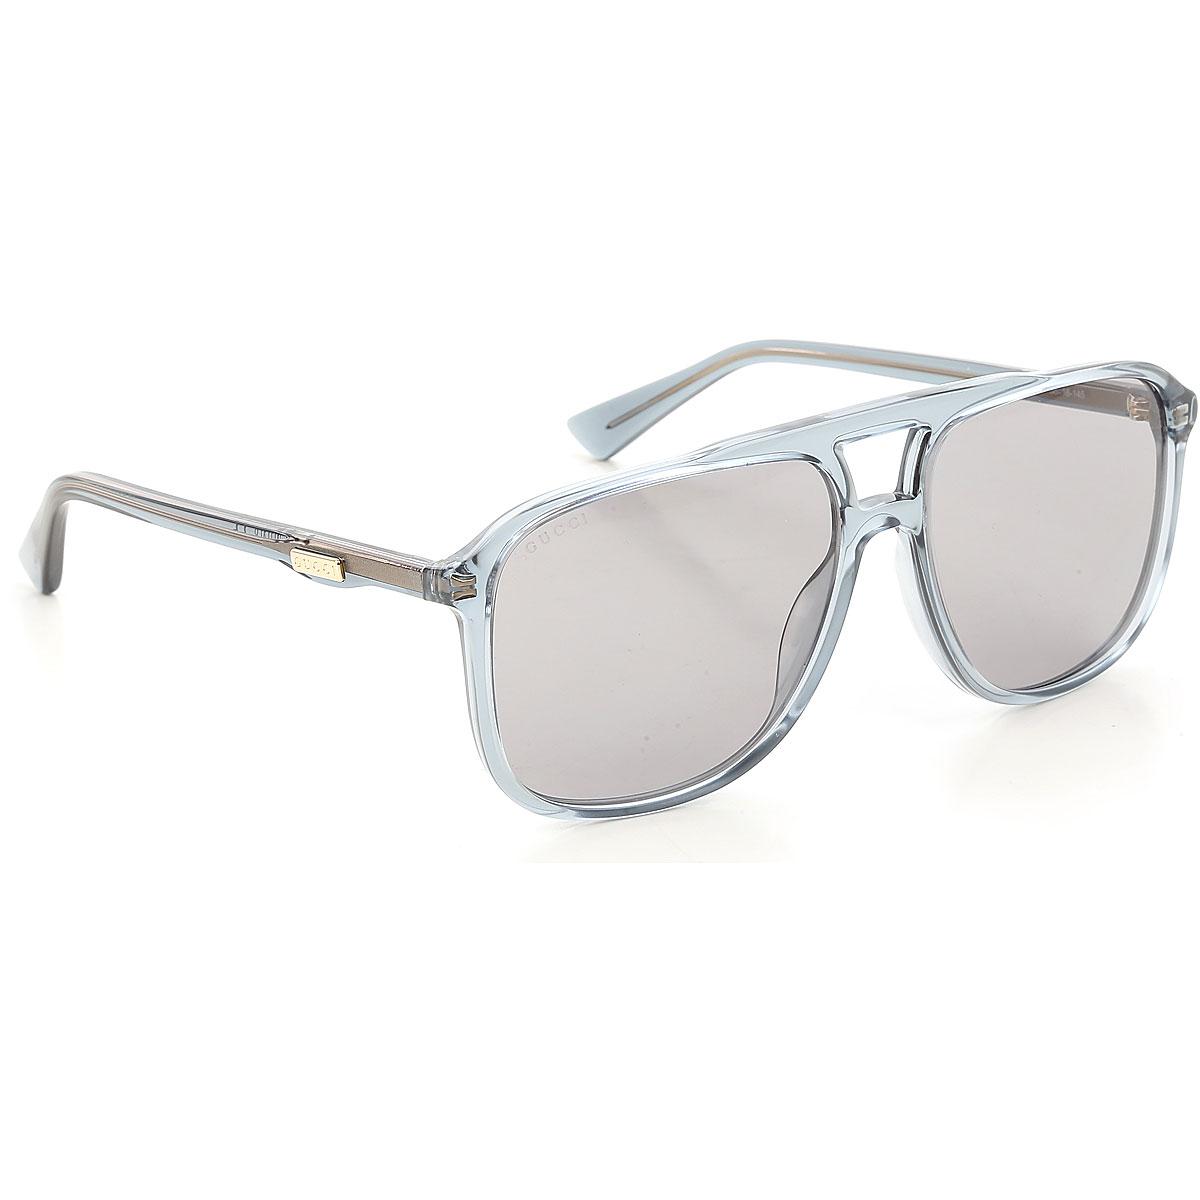 Gafas y Lentes de Sol Gucci, Detalle Modelo: gg0262s-007-